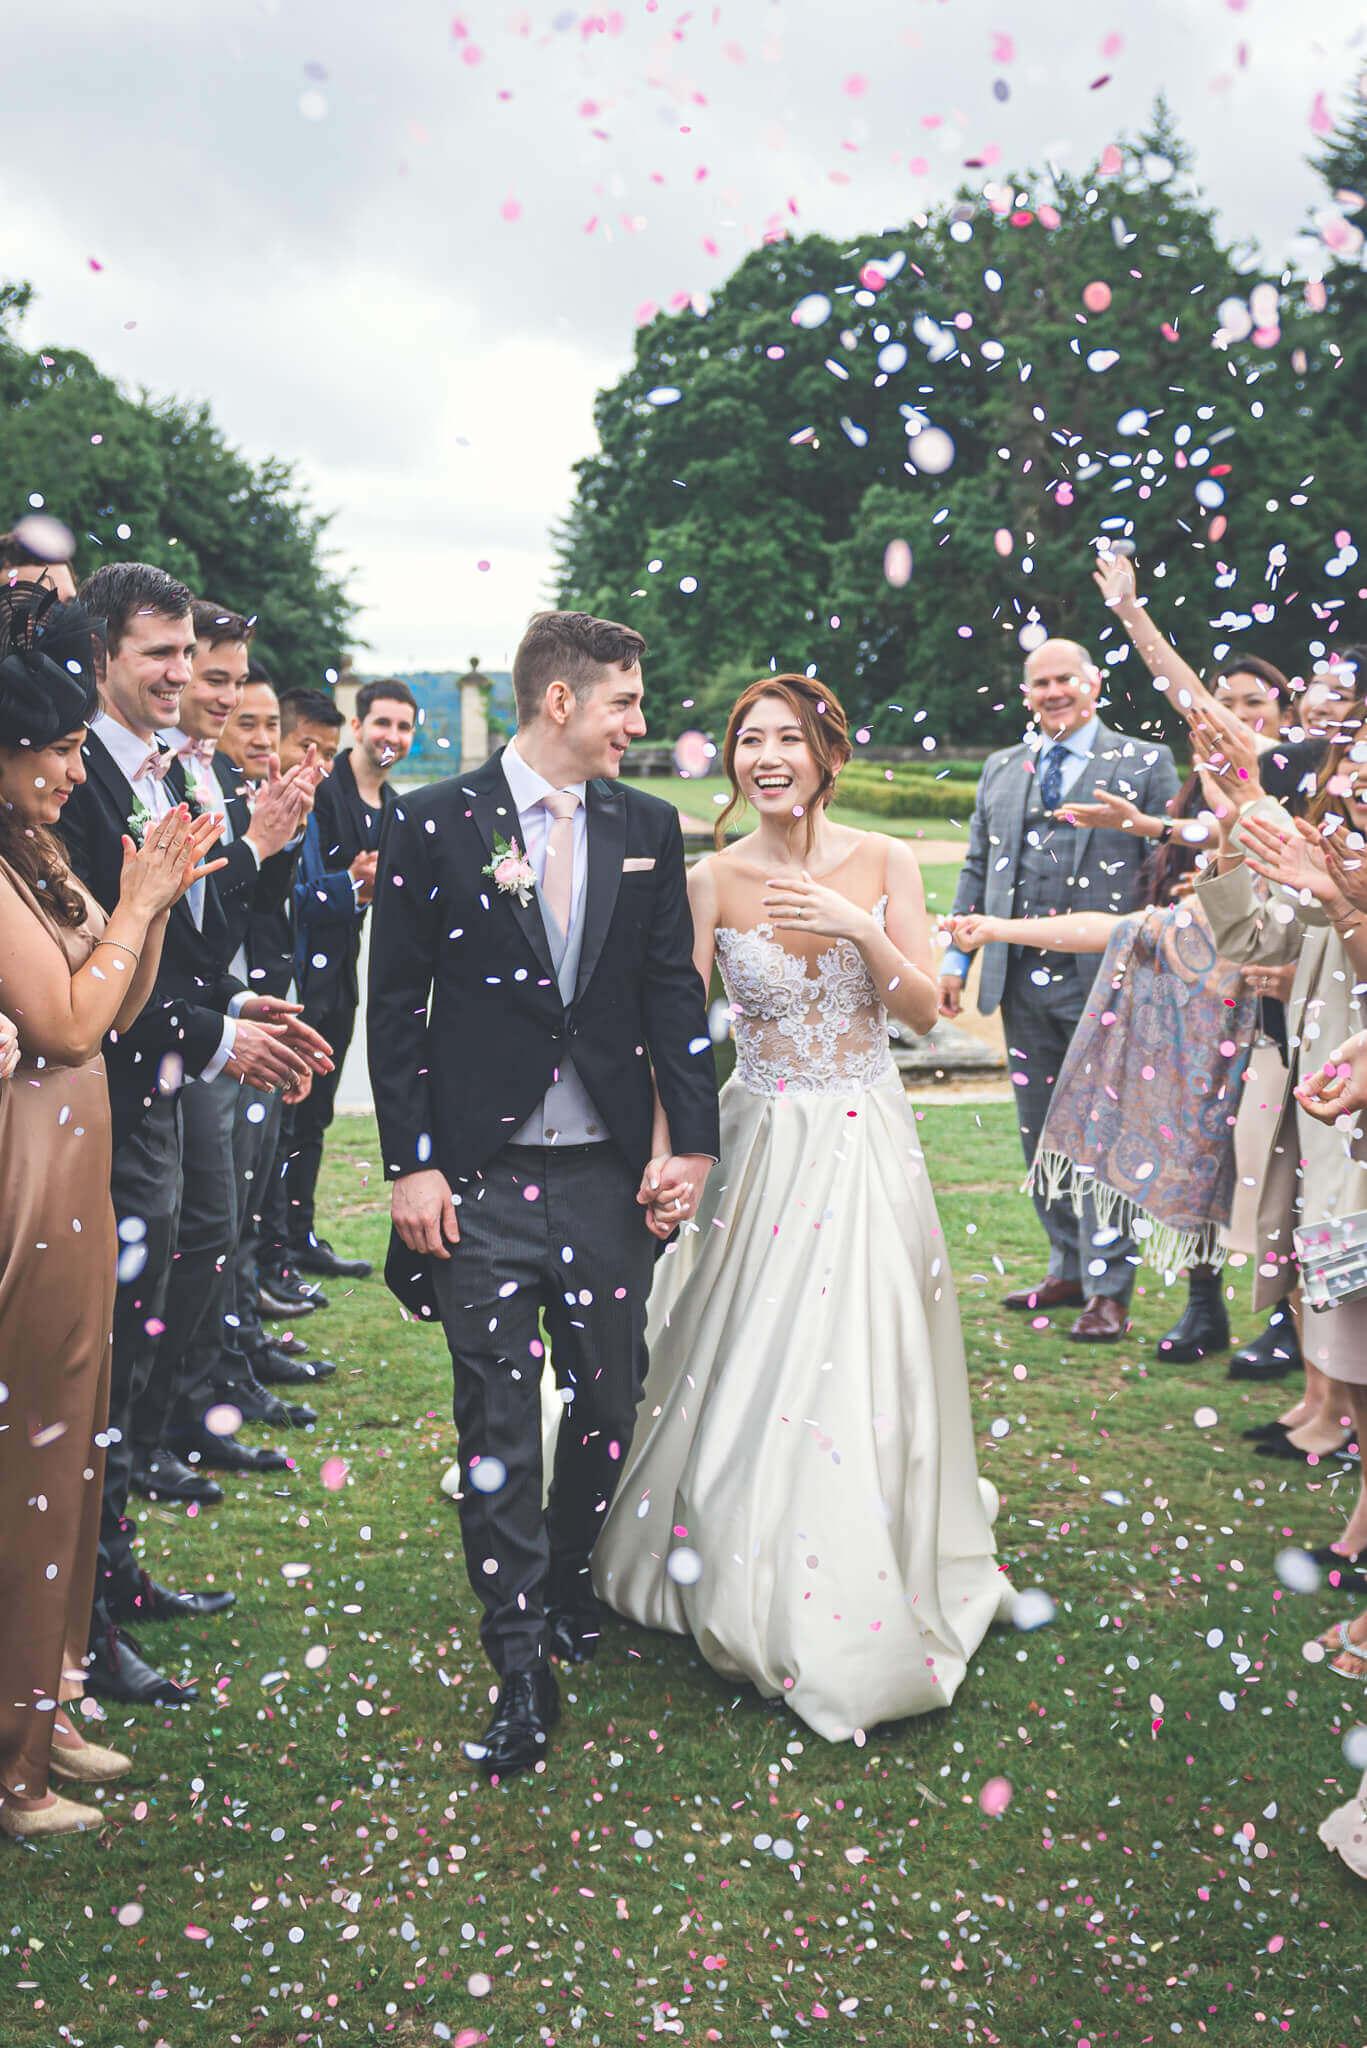 Bride & Groom confetti ©Ryan Hewett photography